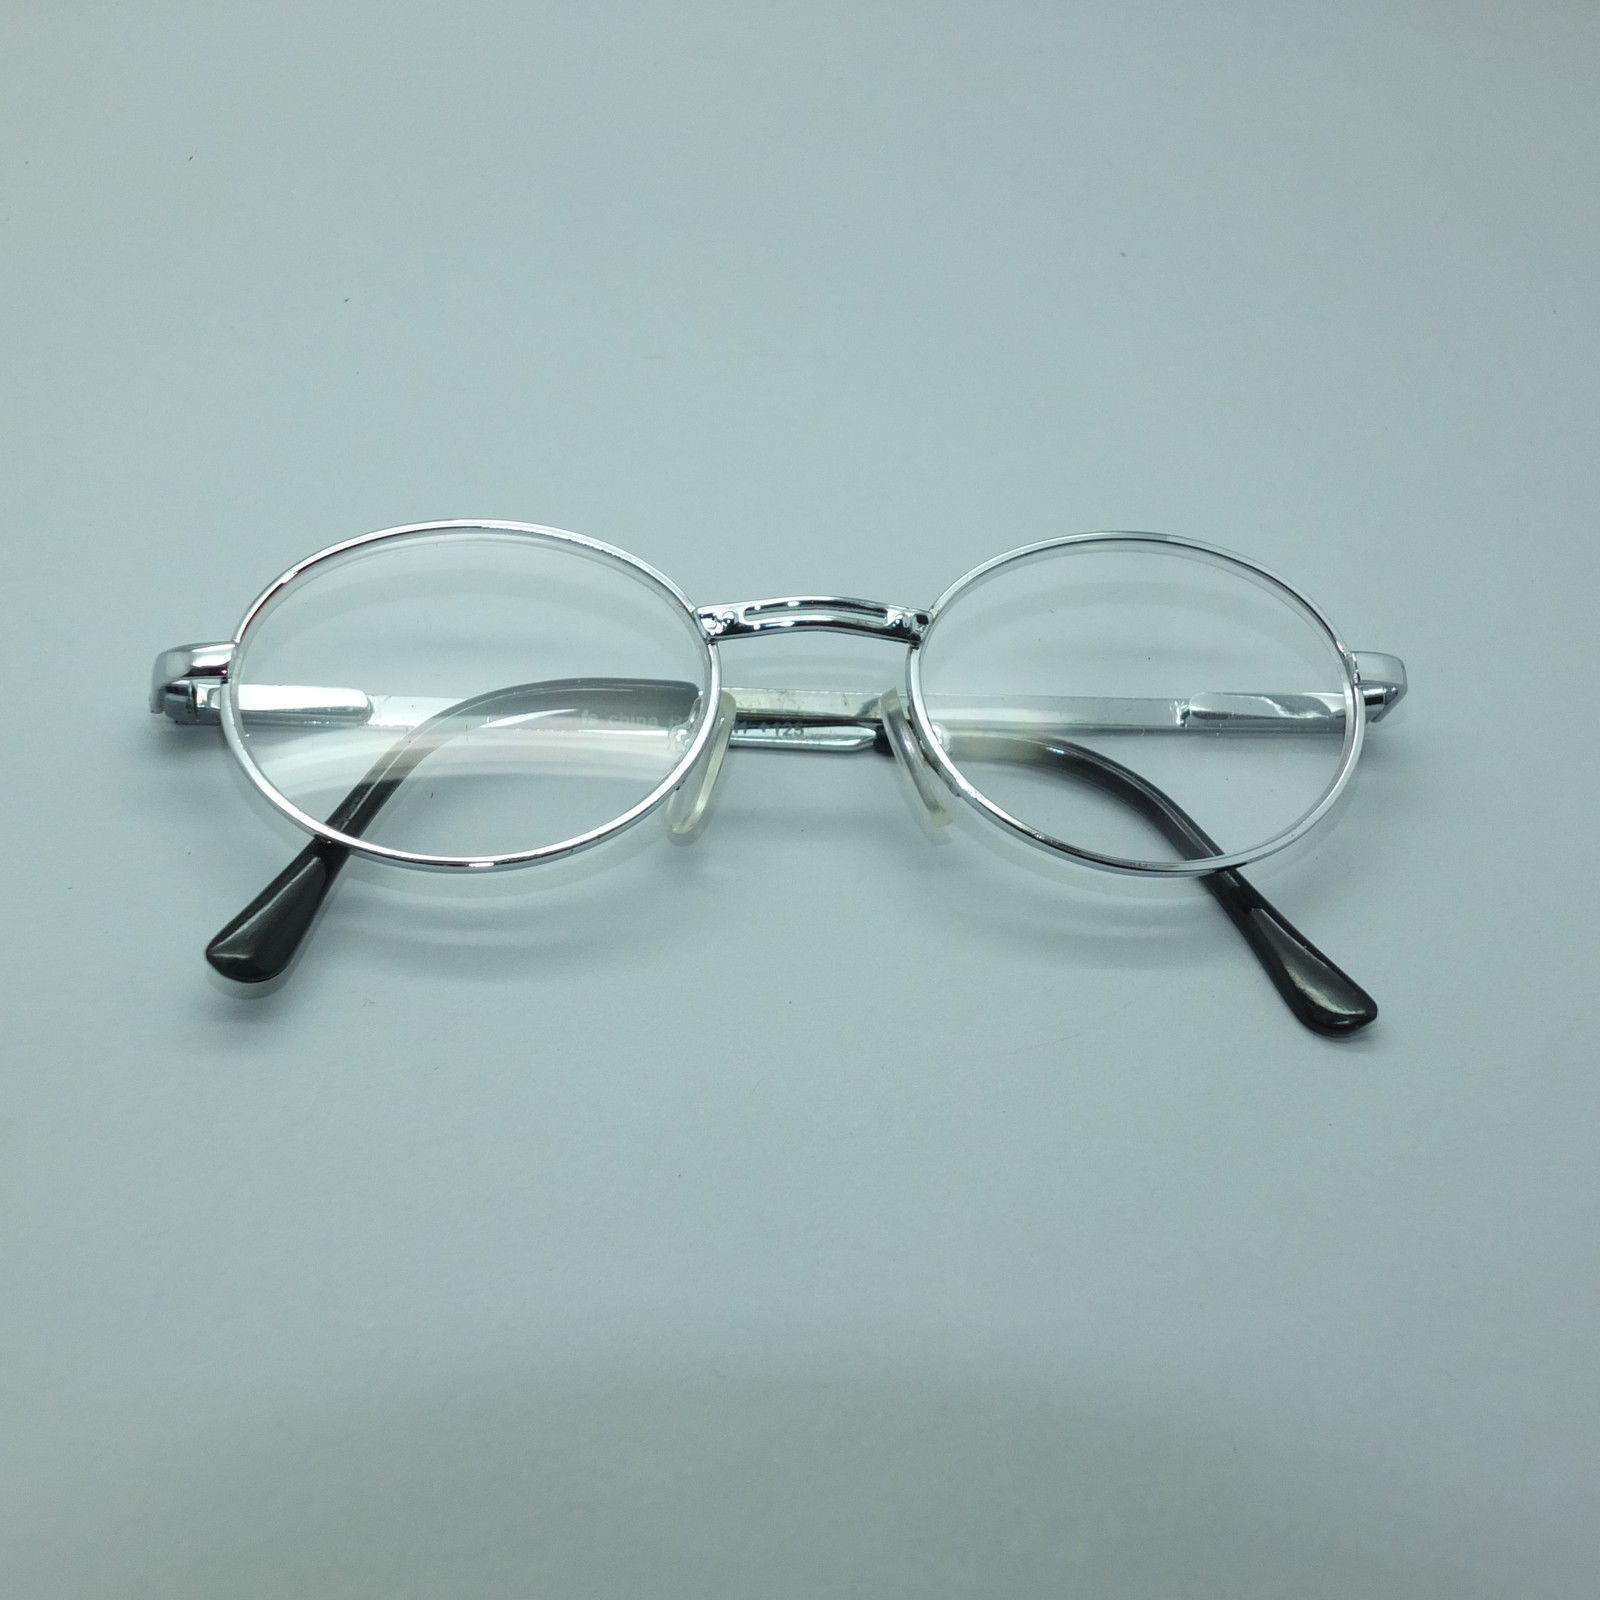 reading glasses silver metal pretty oval frame 1 25 lens